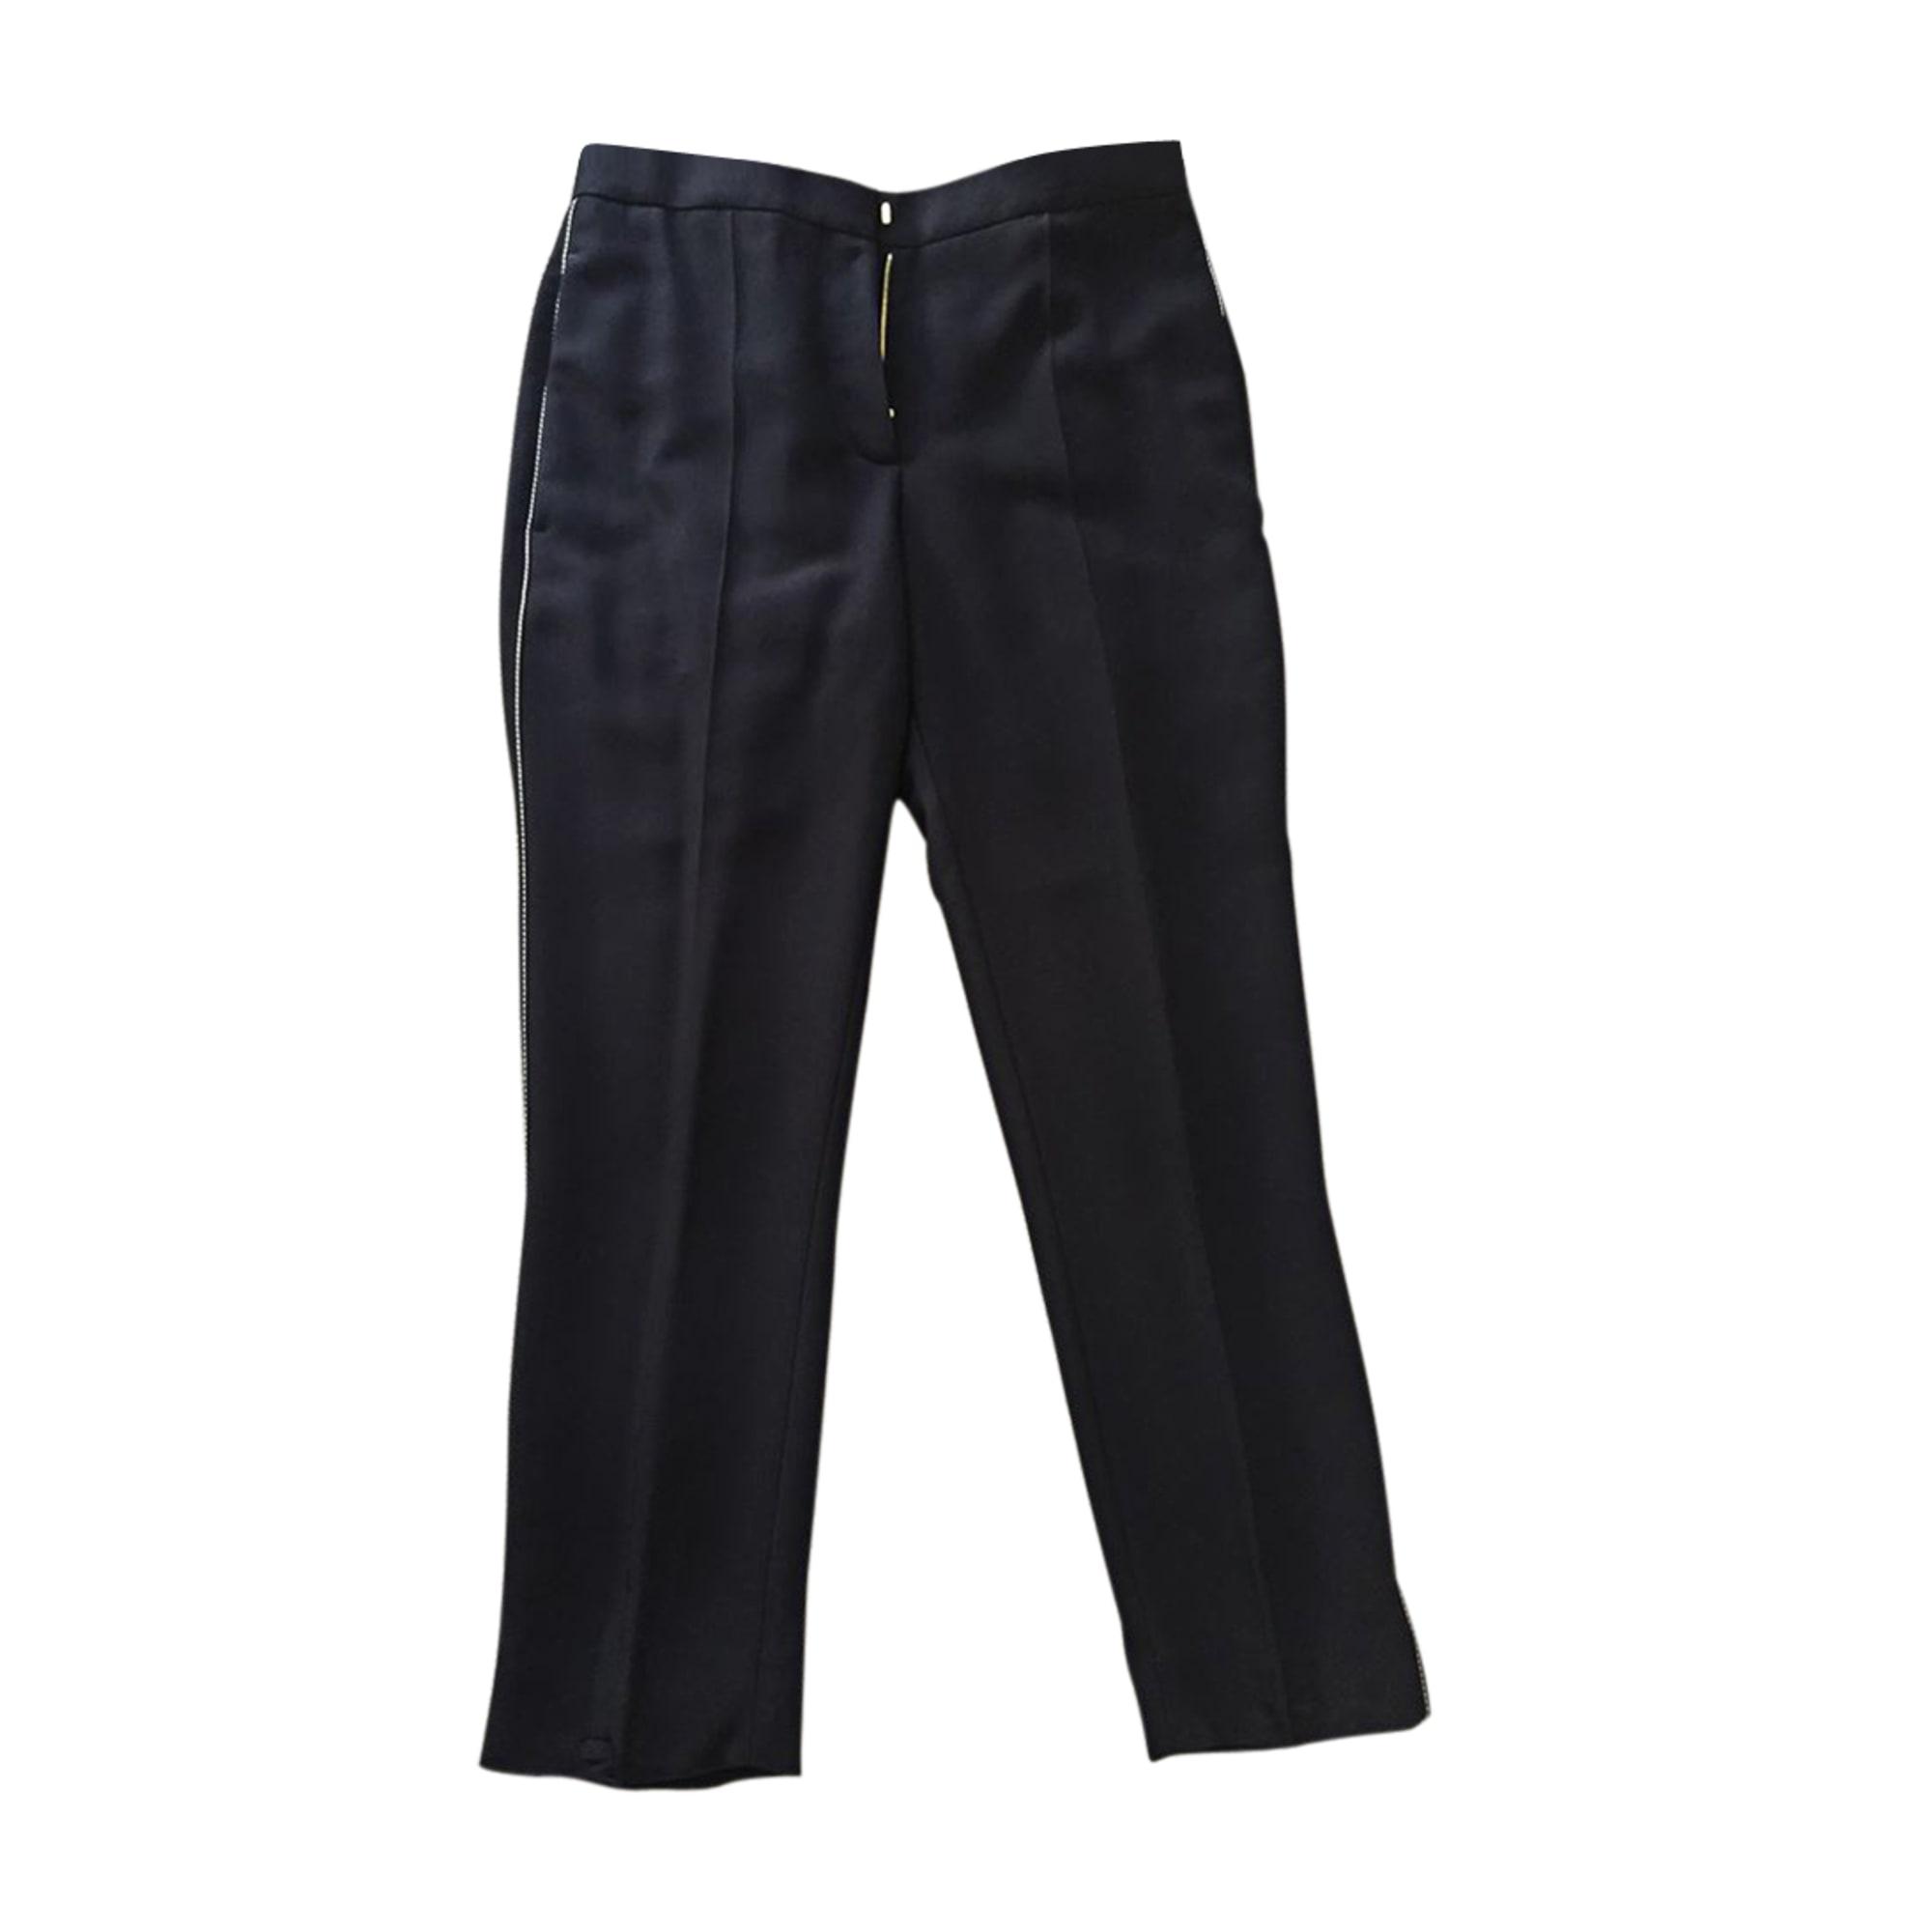 Pantalon droit SONIA RYKIEL Noir